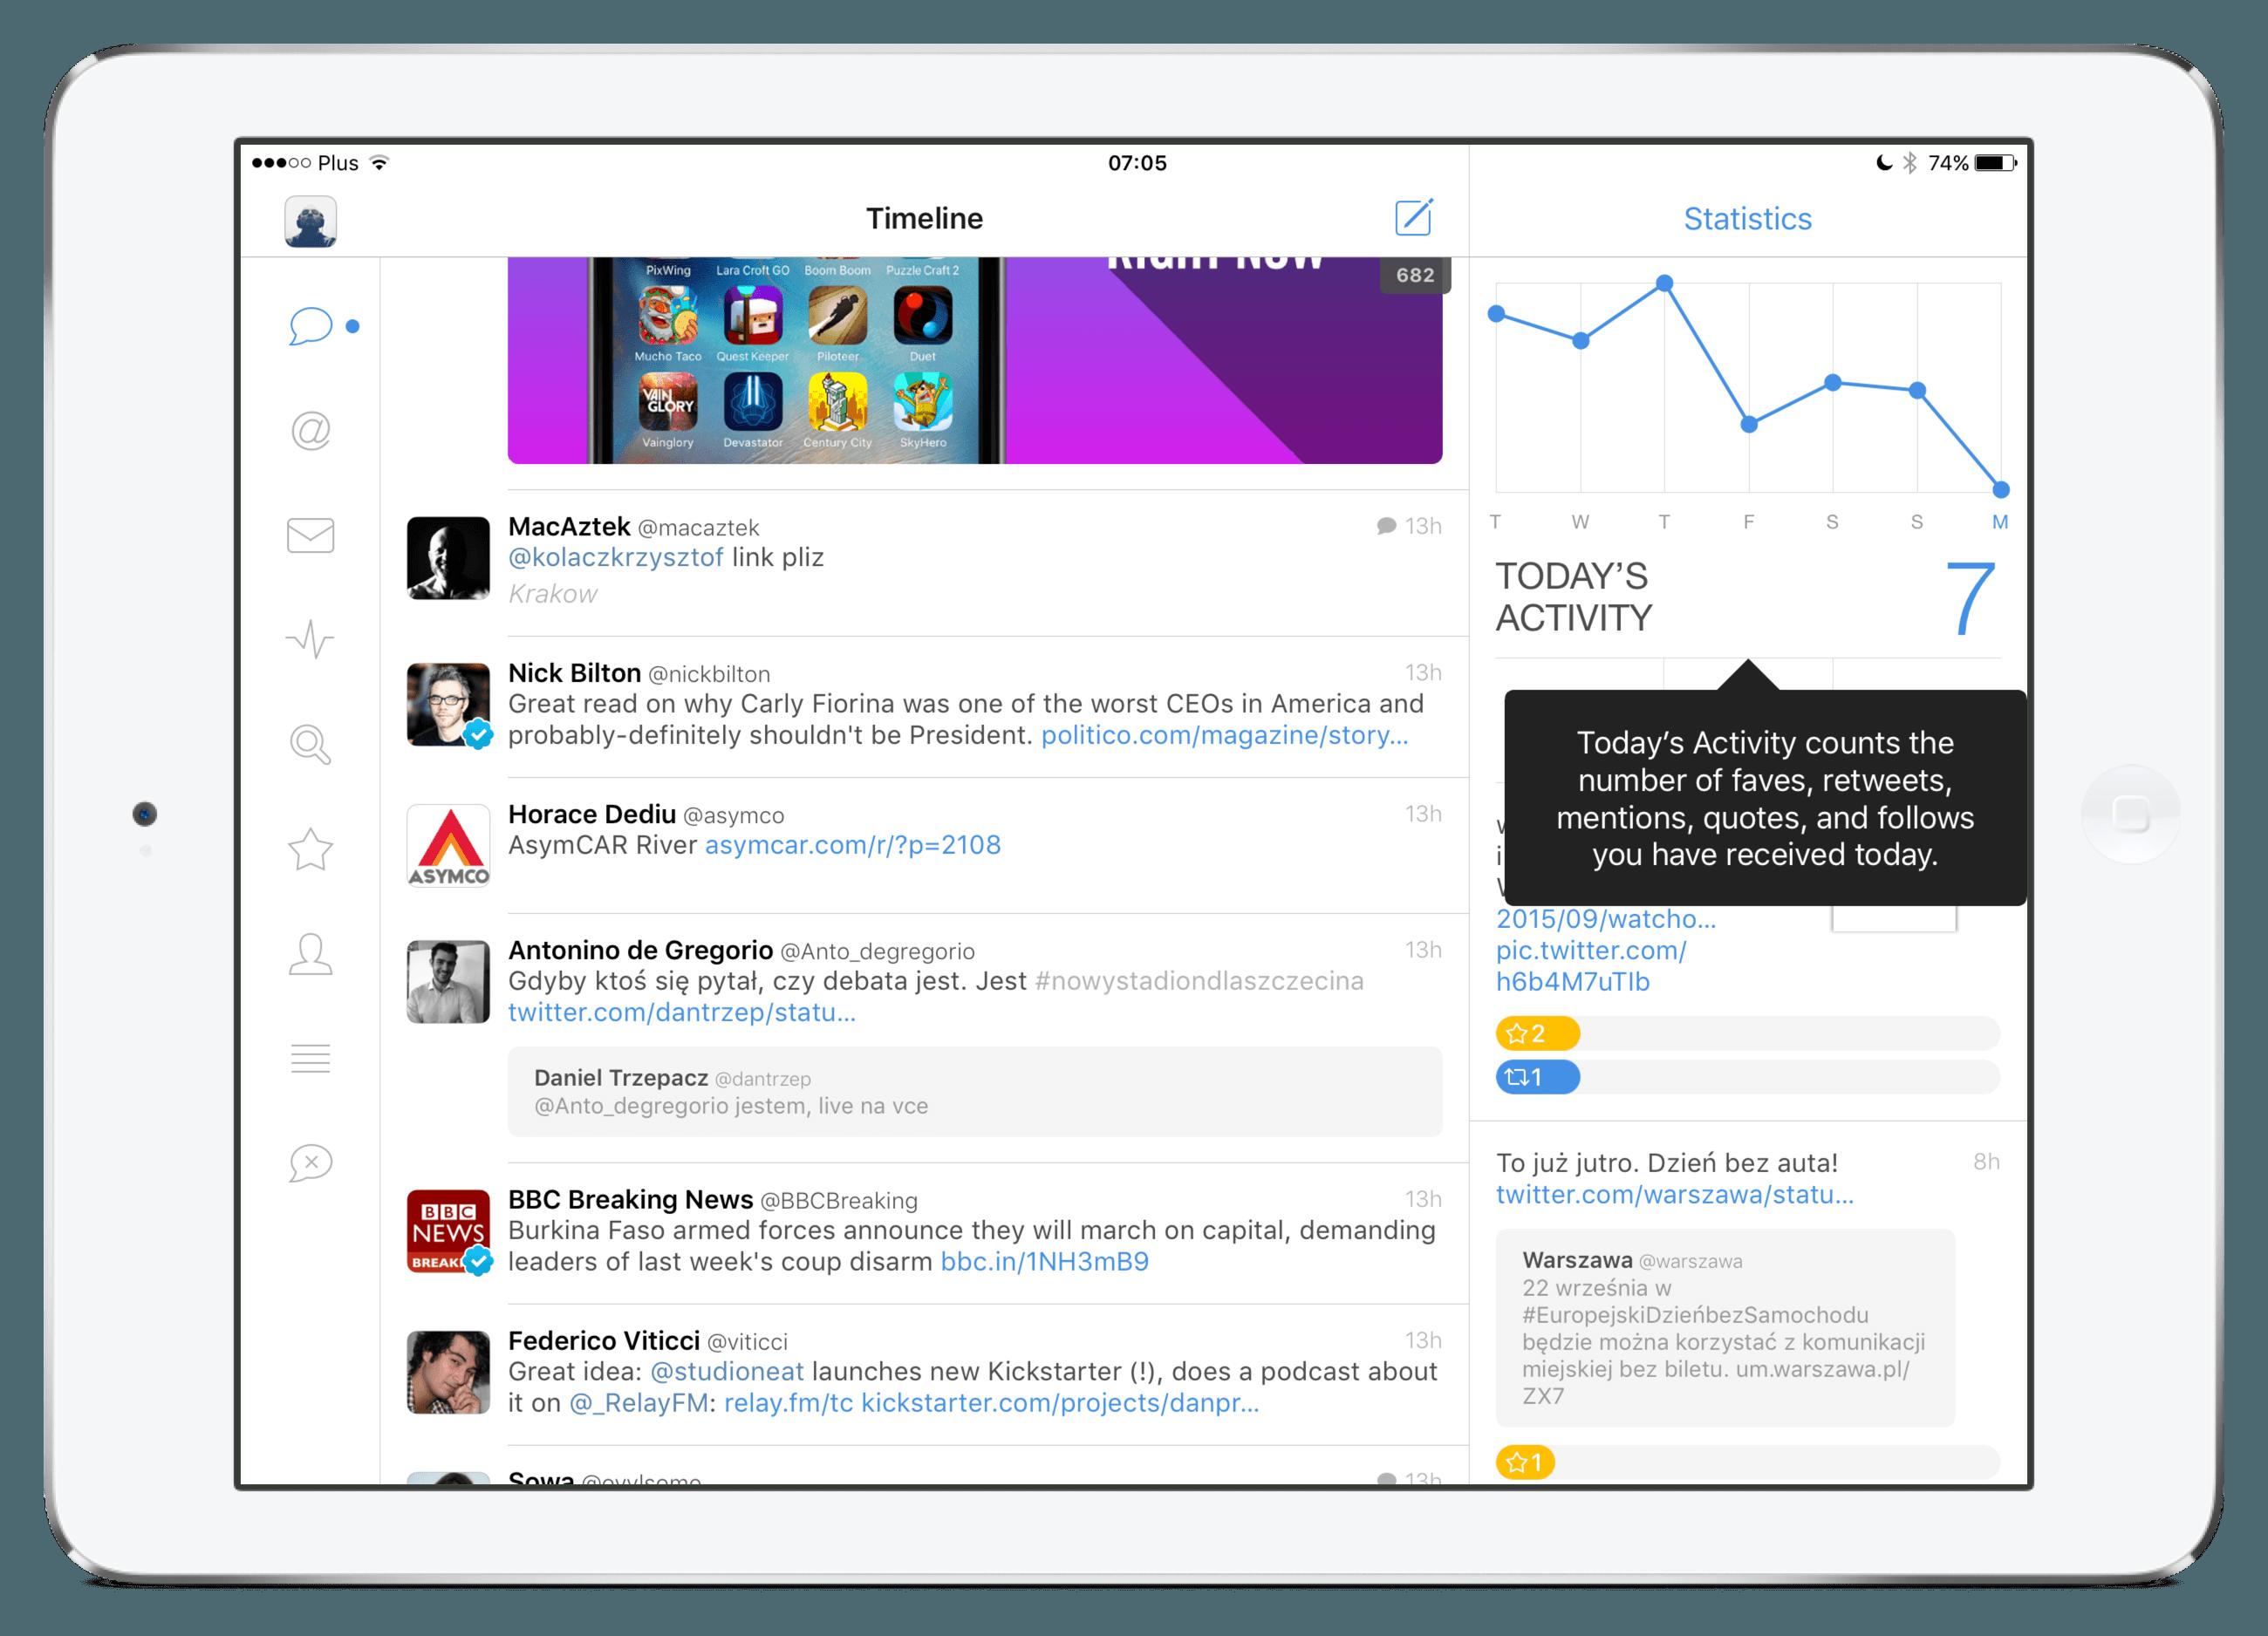 Tweetbot 4 - iPad - landscape timeline 01 - device